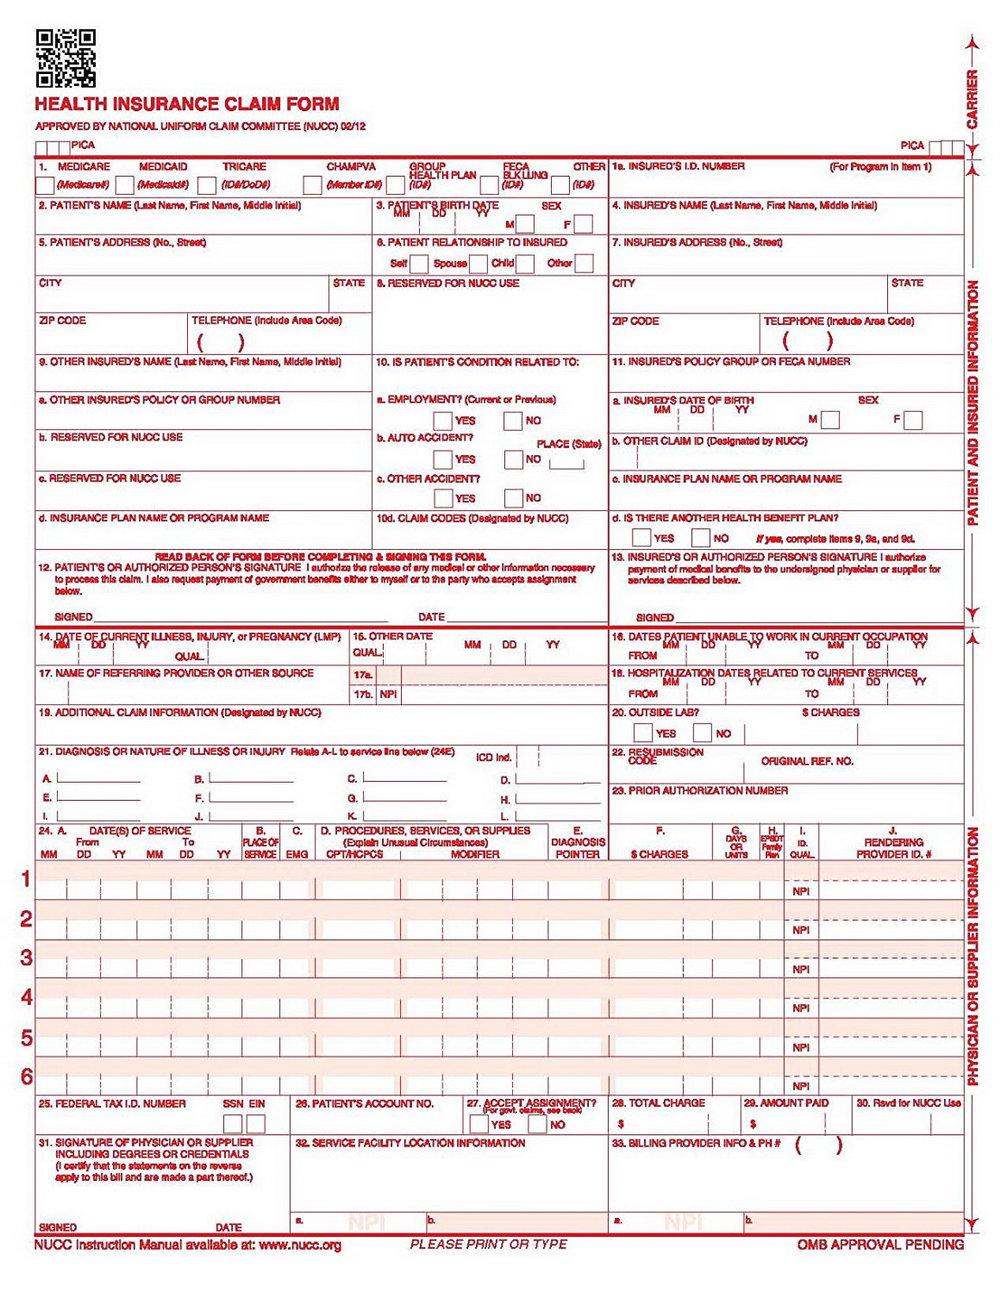 Hcfa Claim Form 2017